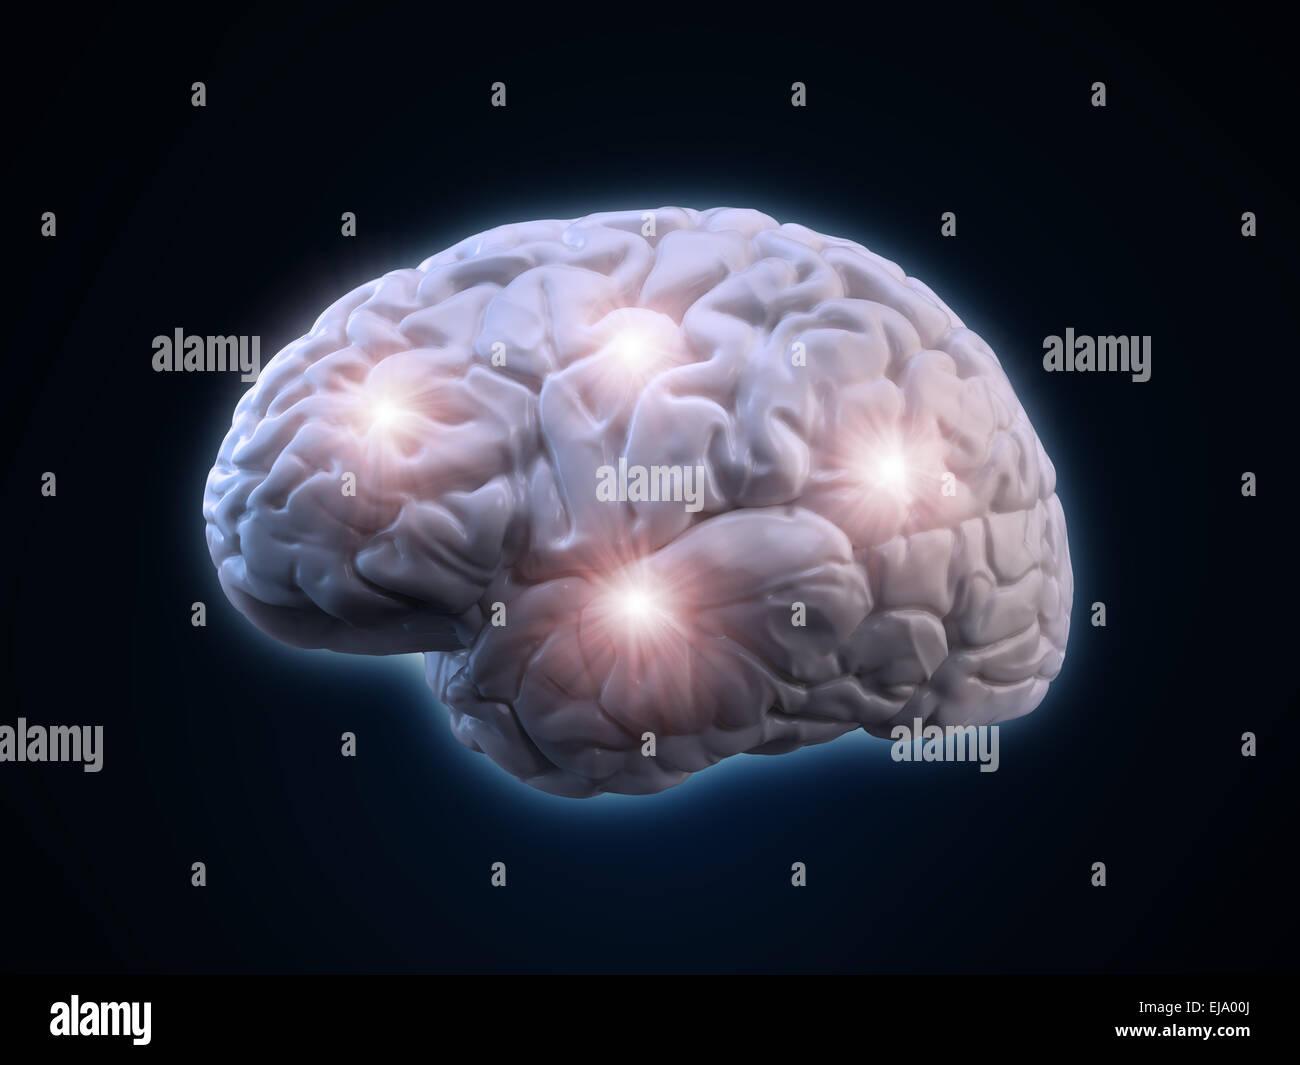 Human brain illustration - human anatomy - Stock Image